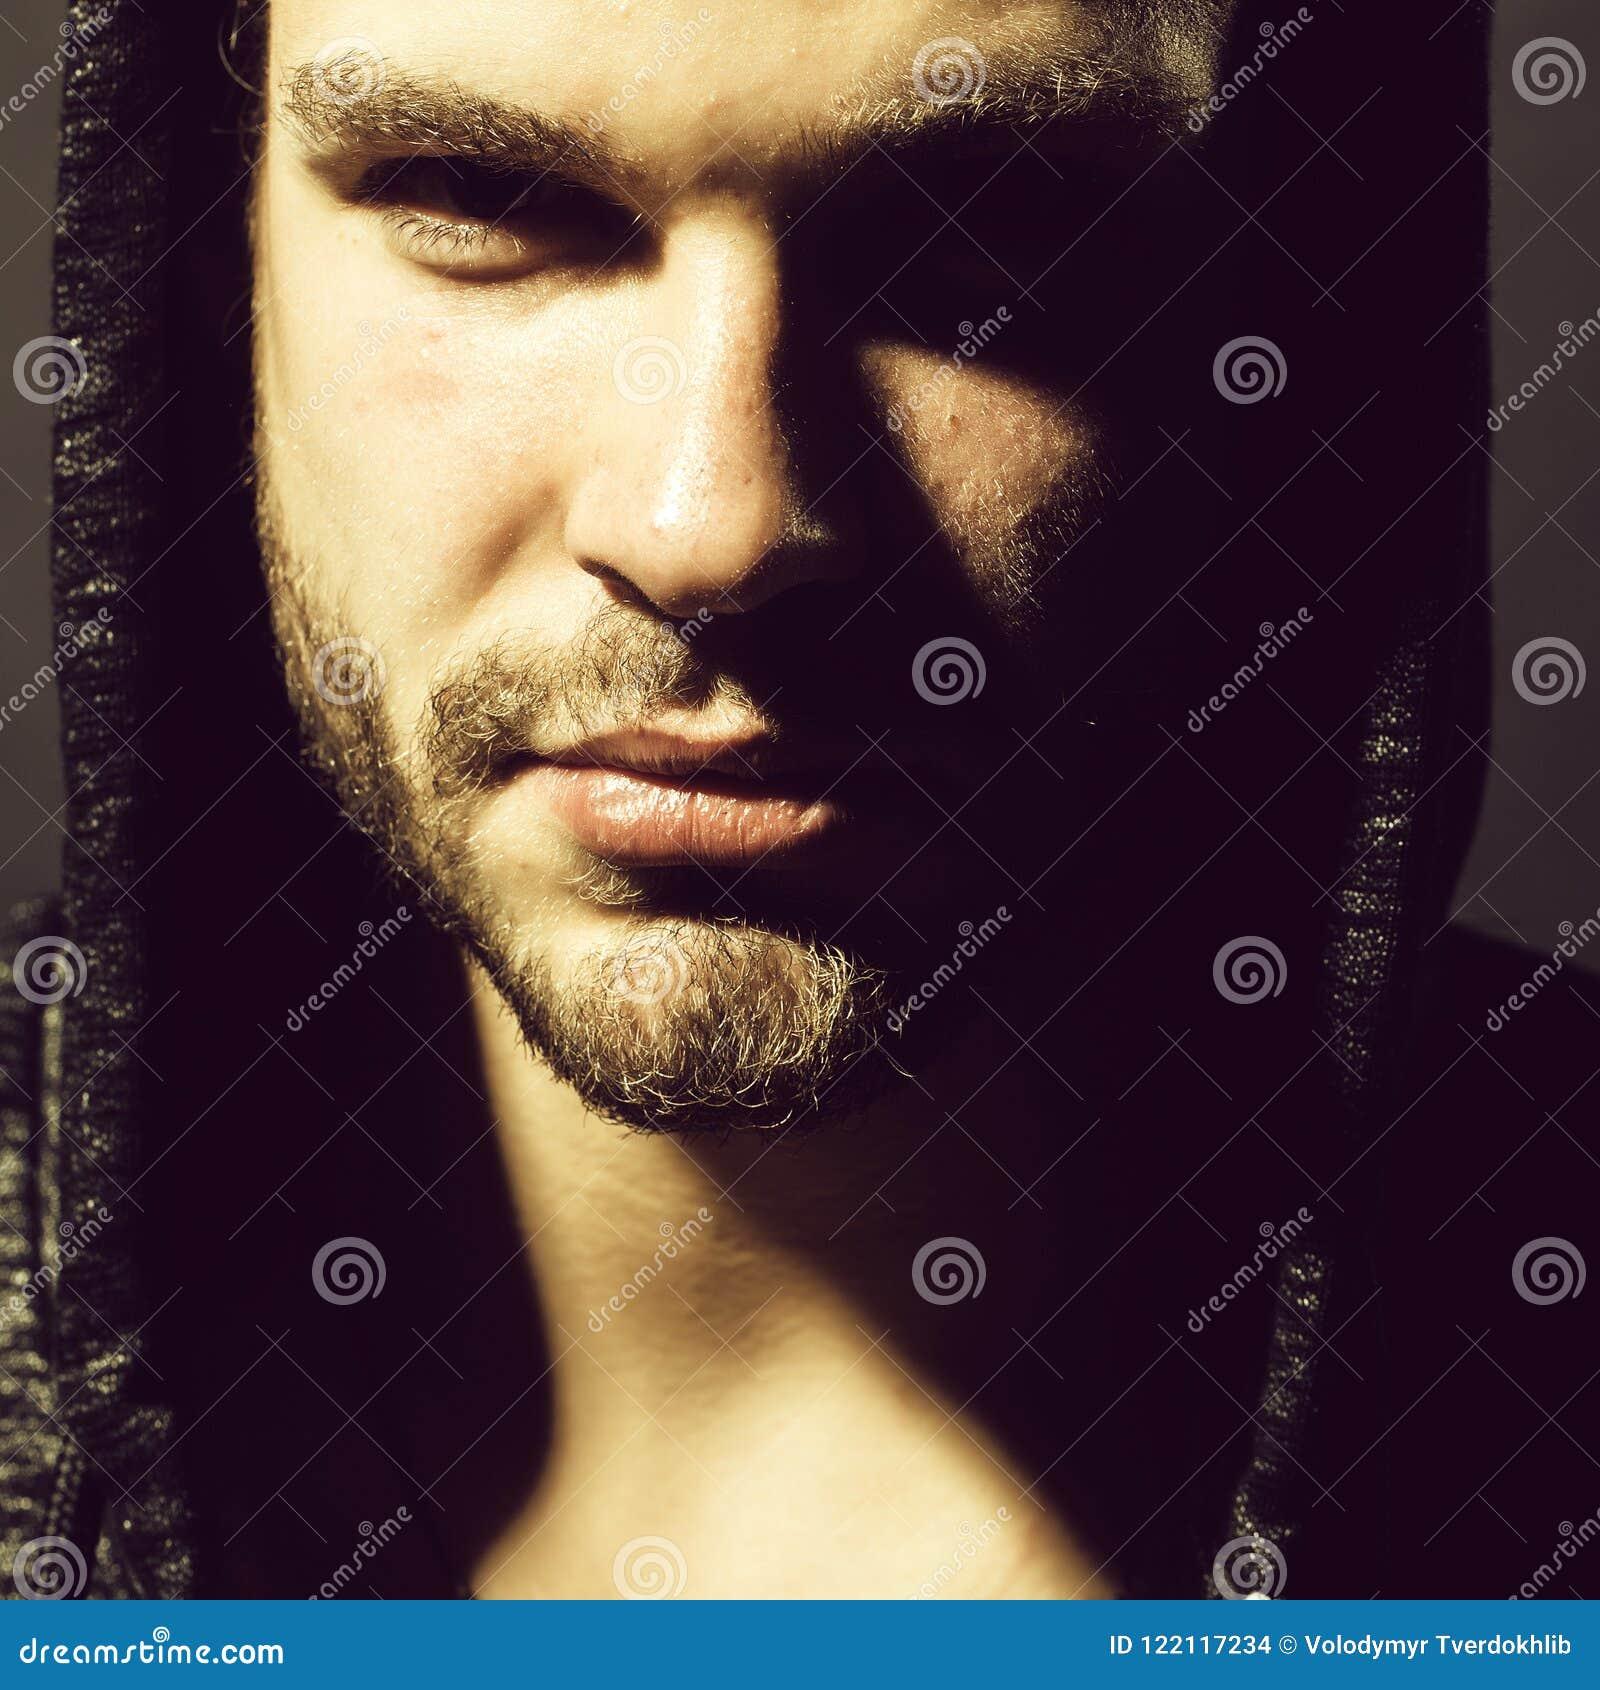 Sexual confident man stock photo. Image of hood, closeup